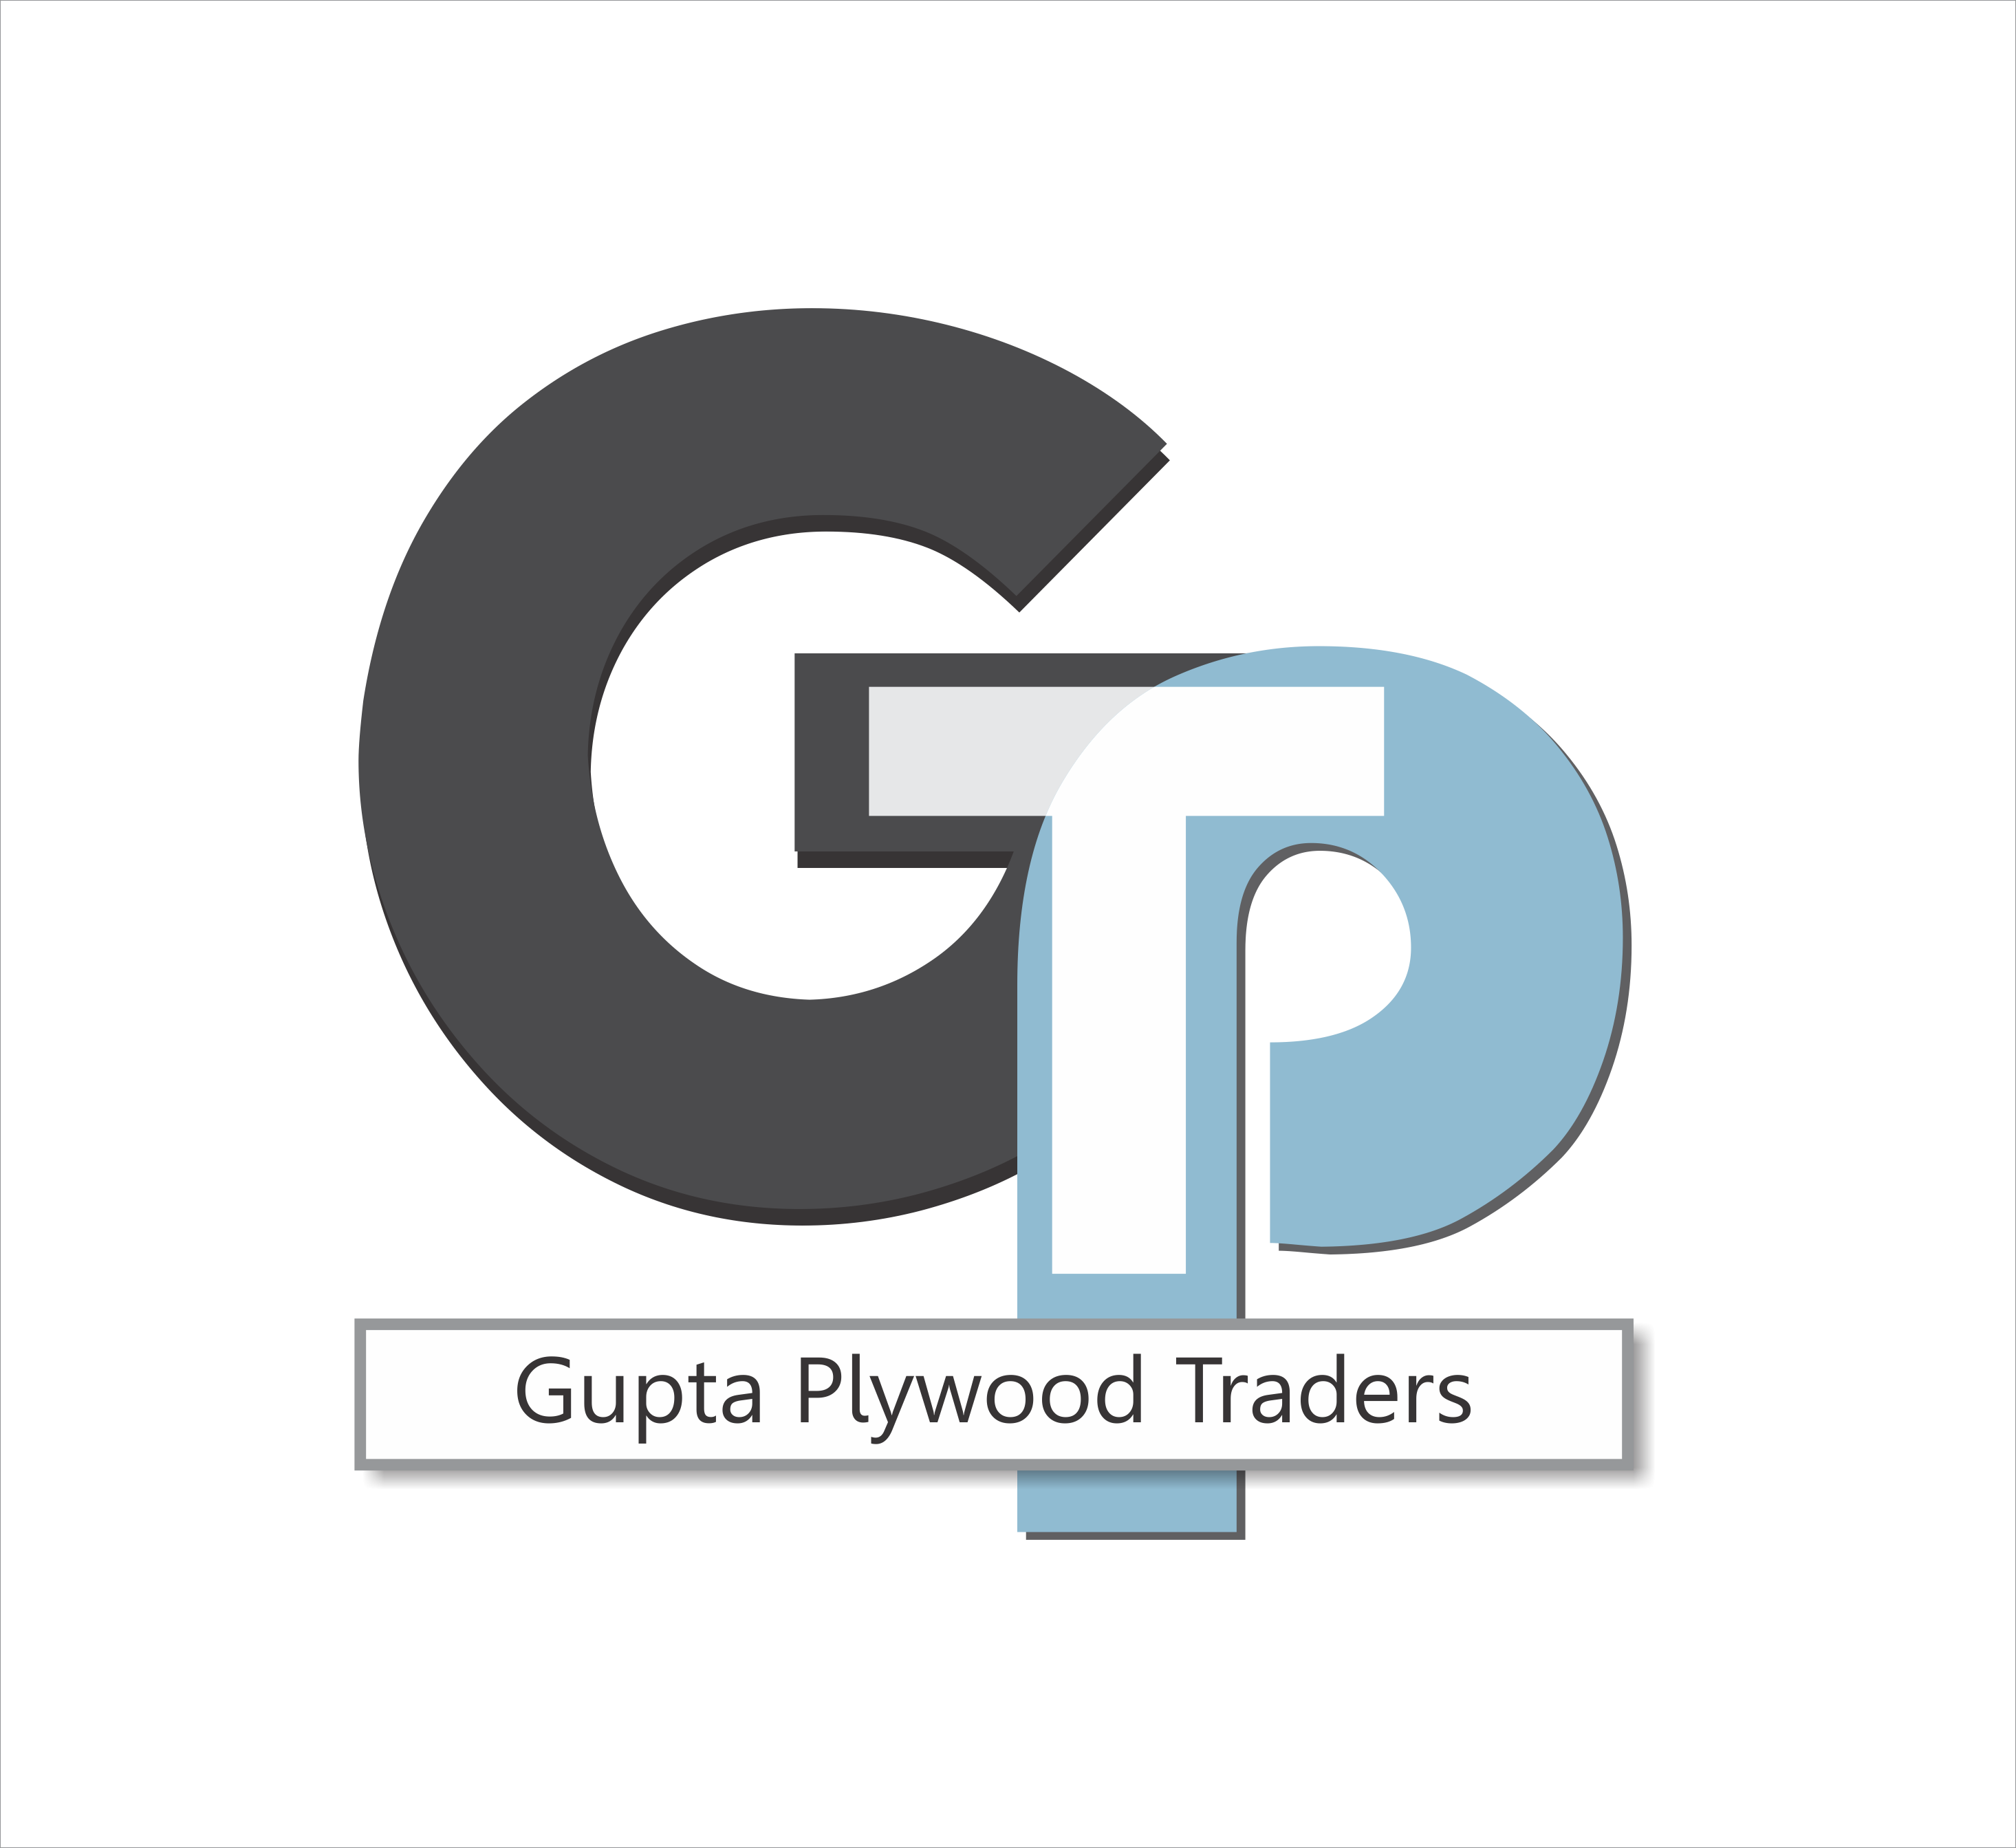 Gupta Plywood Traders